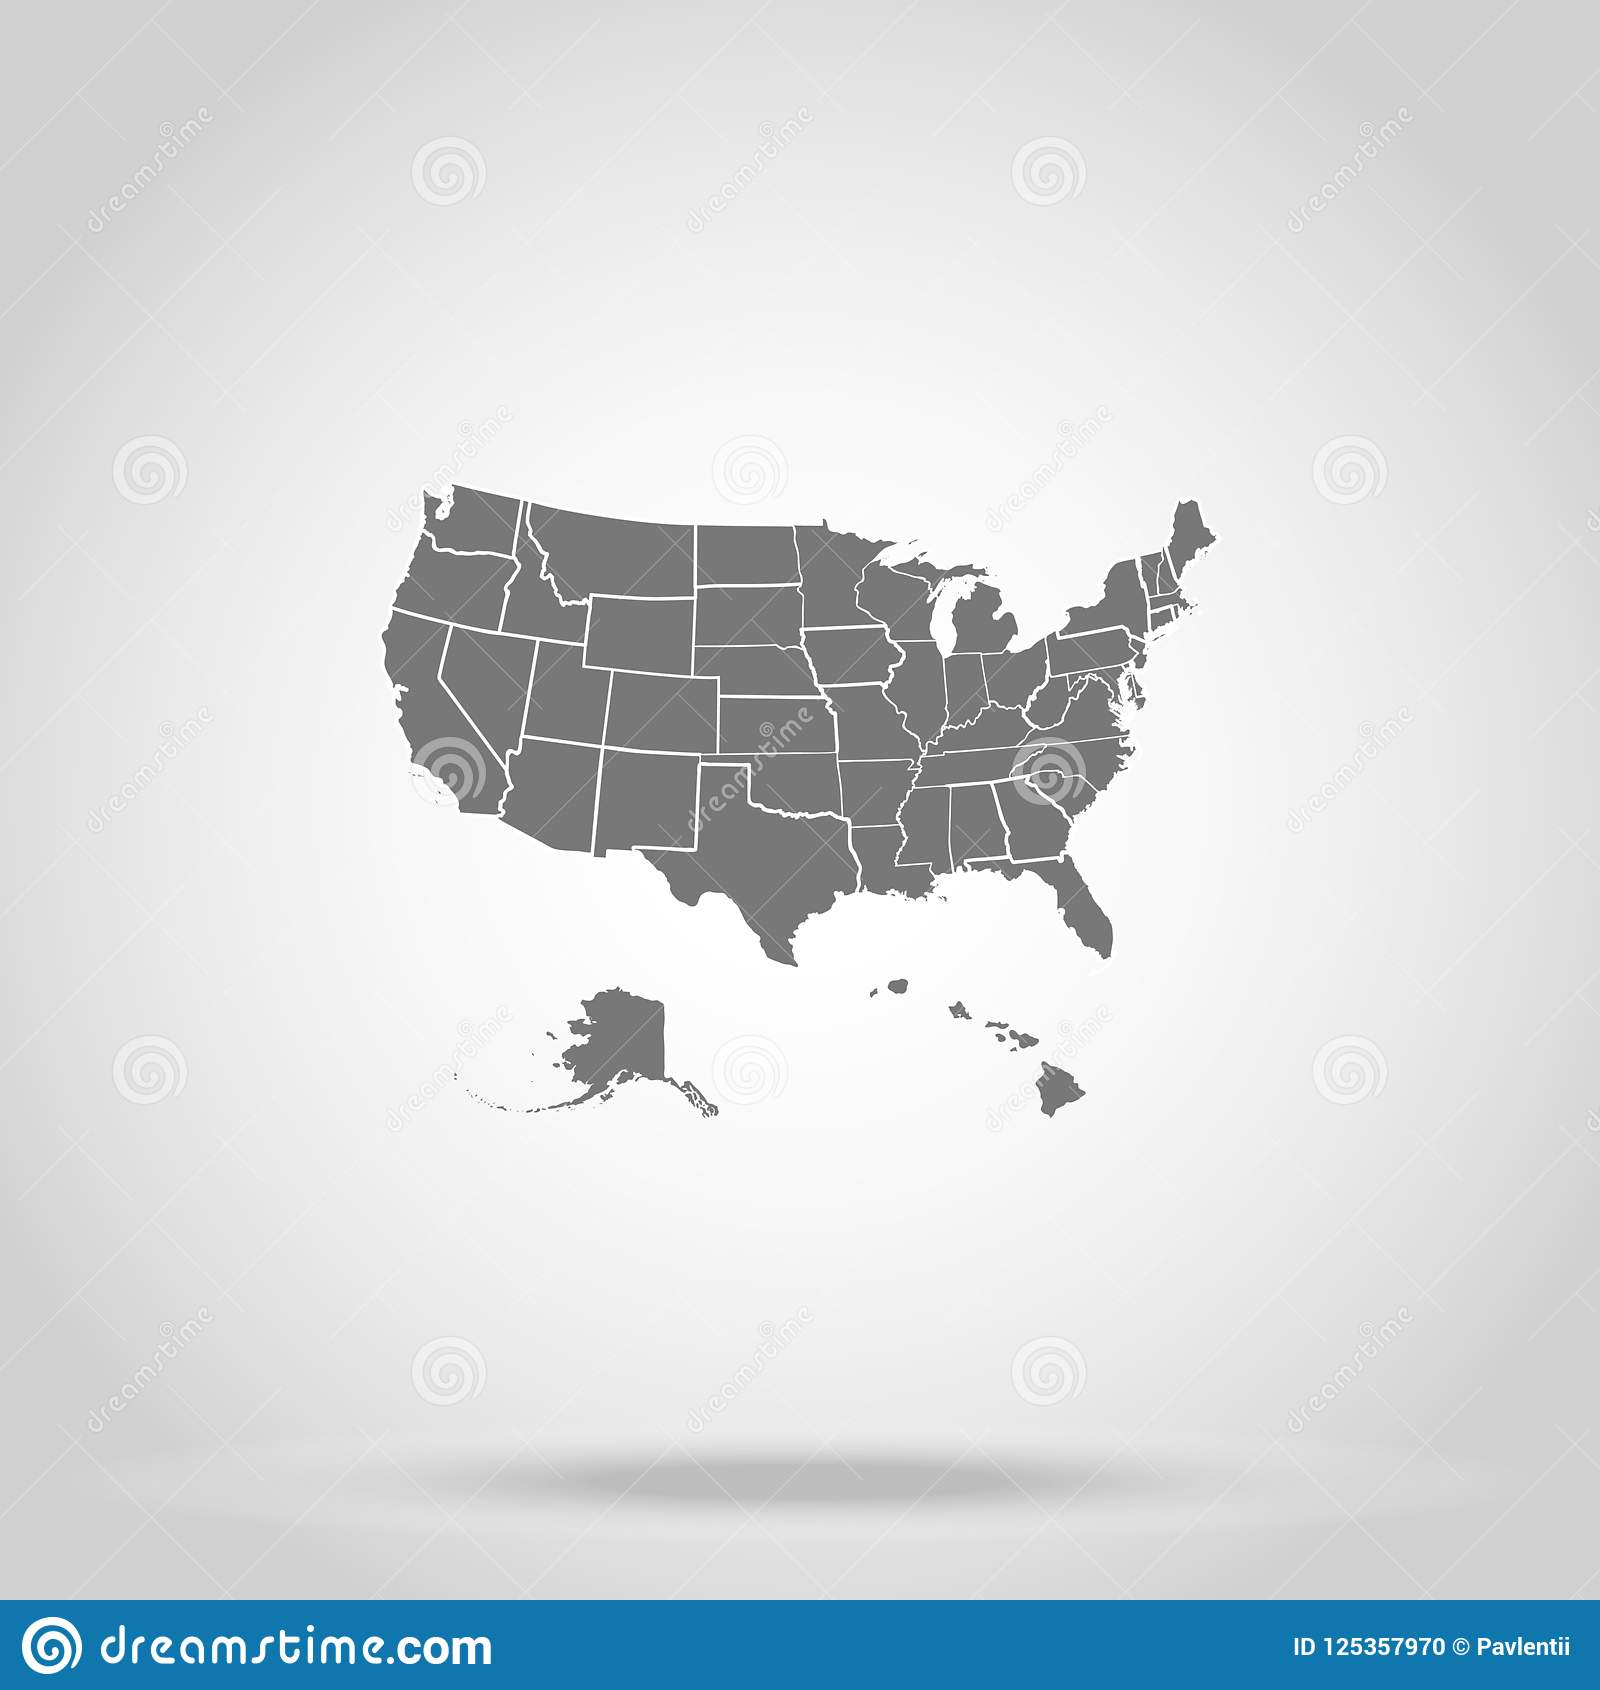 US states of America